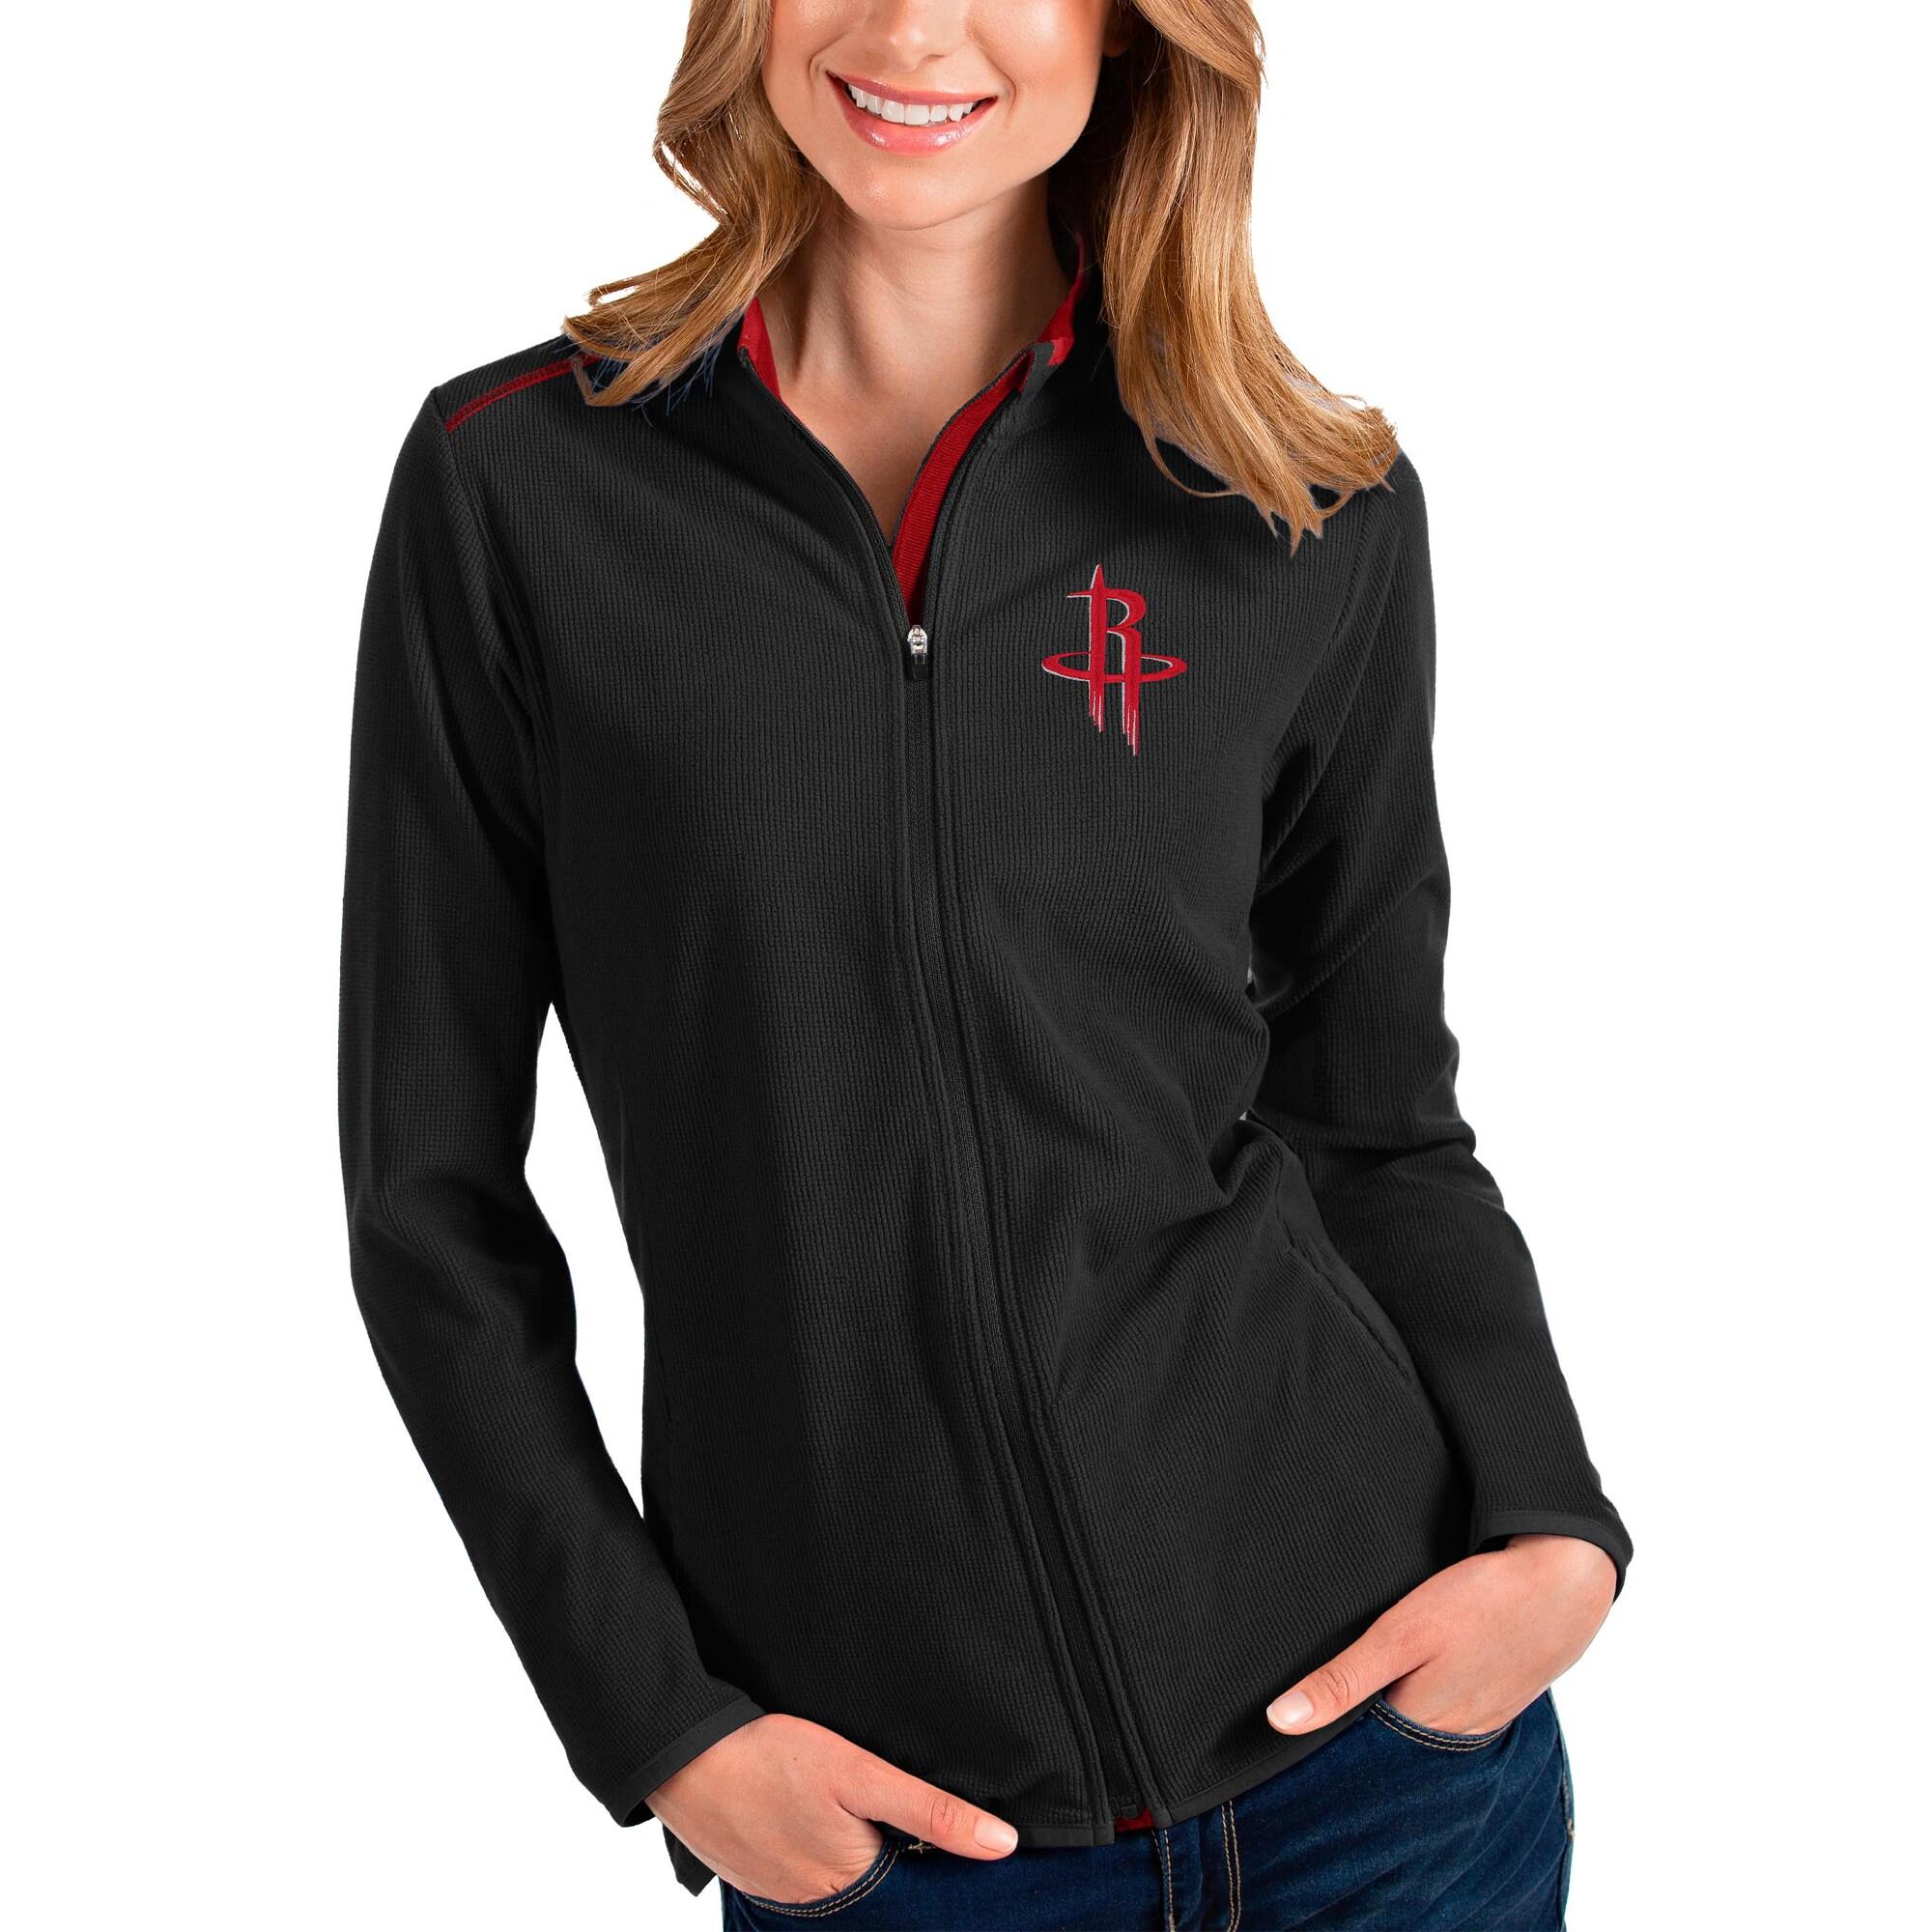 Houston Rockets Antigua Women's Glacier Full-Zip Jacket - Black/Red